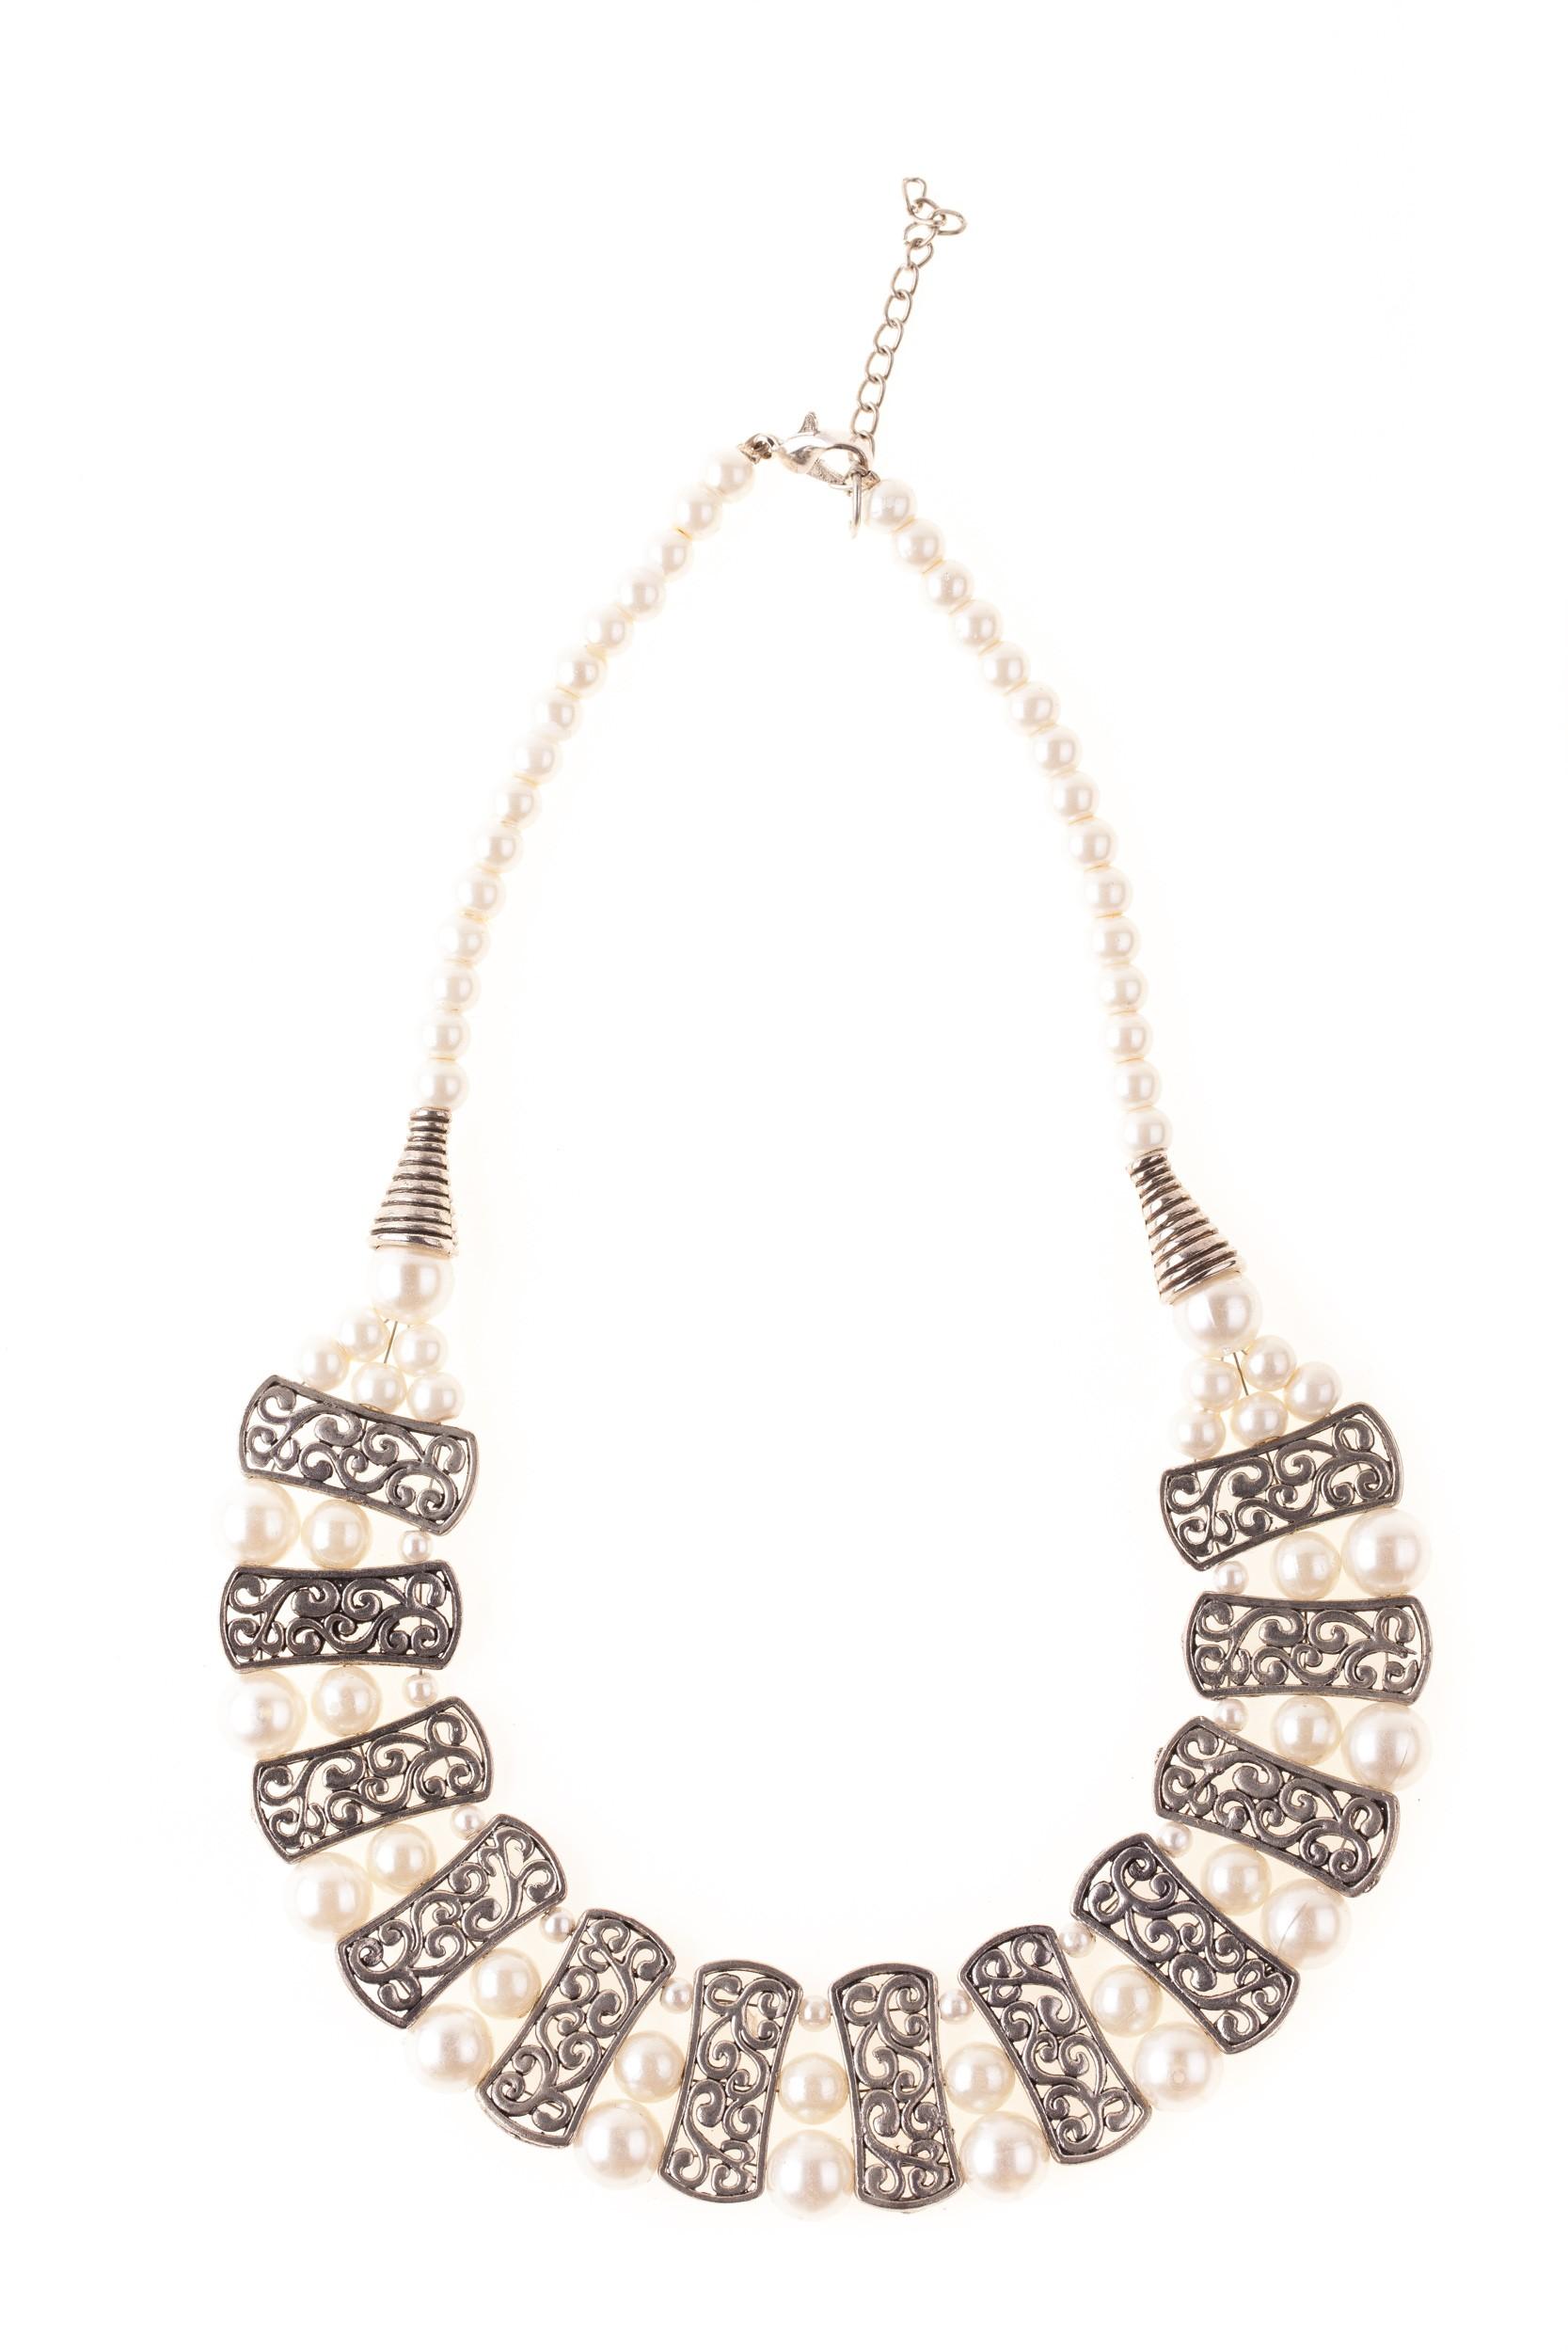 Colier argintiu cu perle